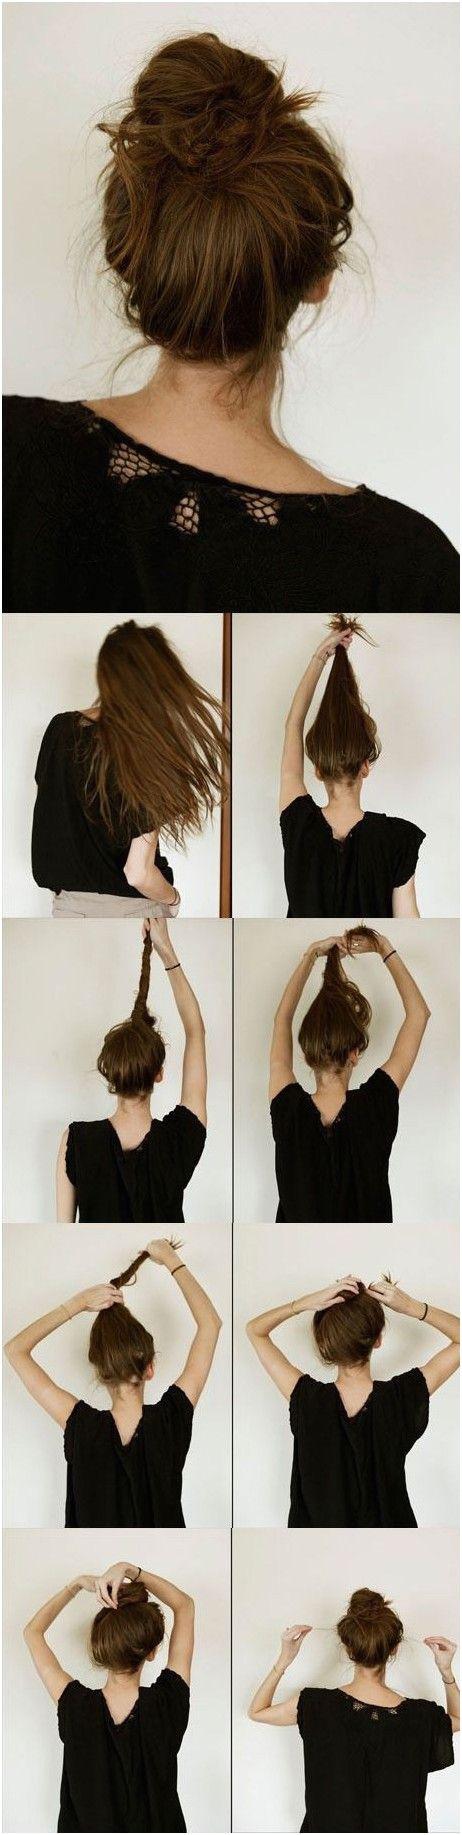 10 Ways to Make Cute Everyday Hairstyles Long Hair Tutorials All things hair Pinterest